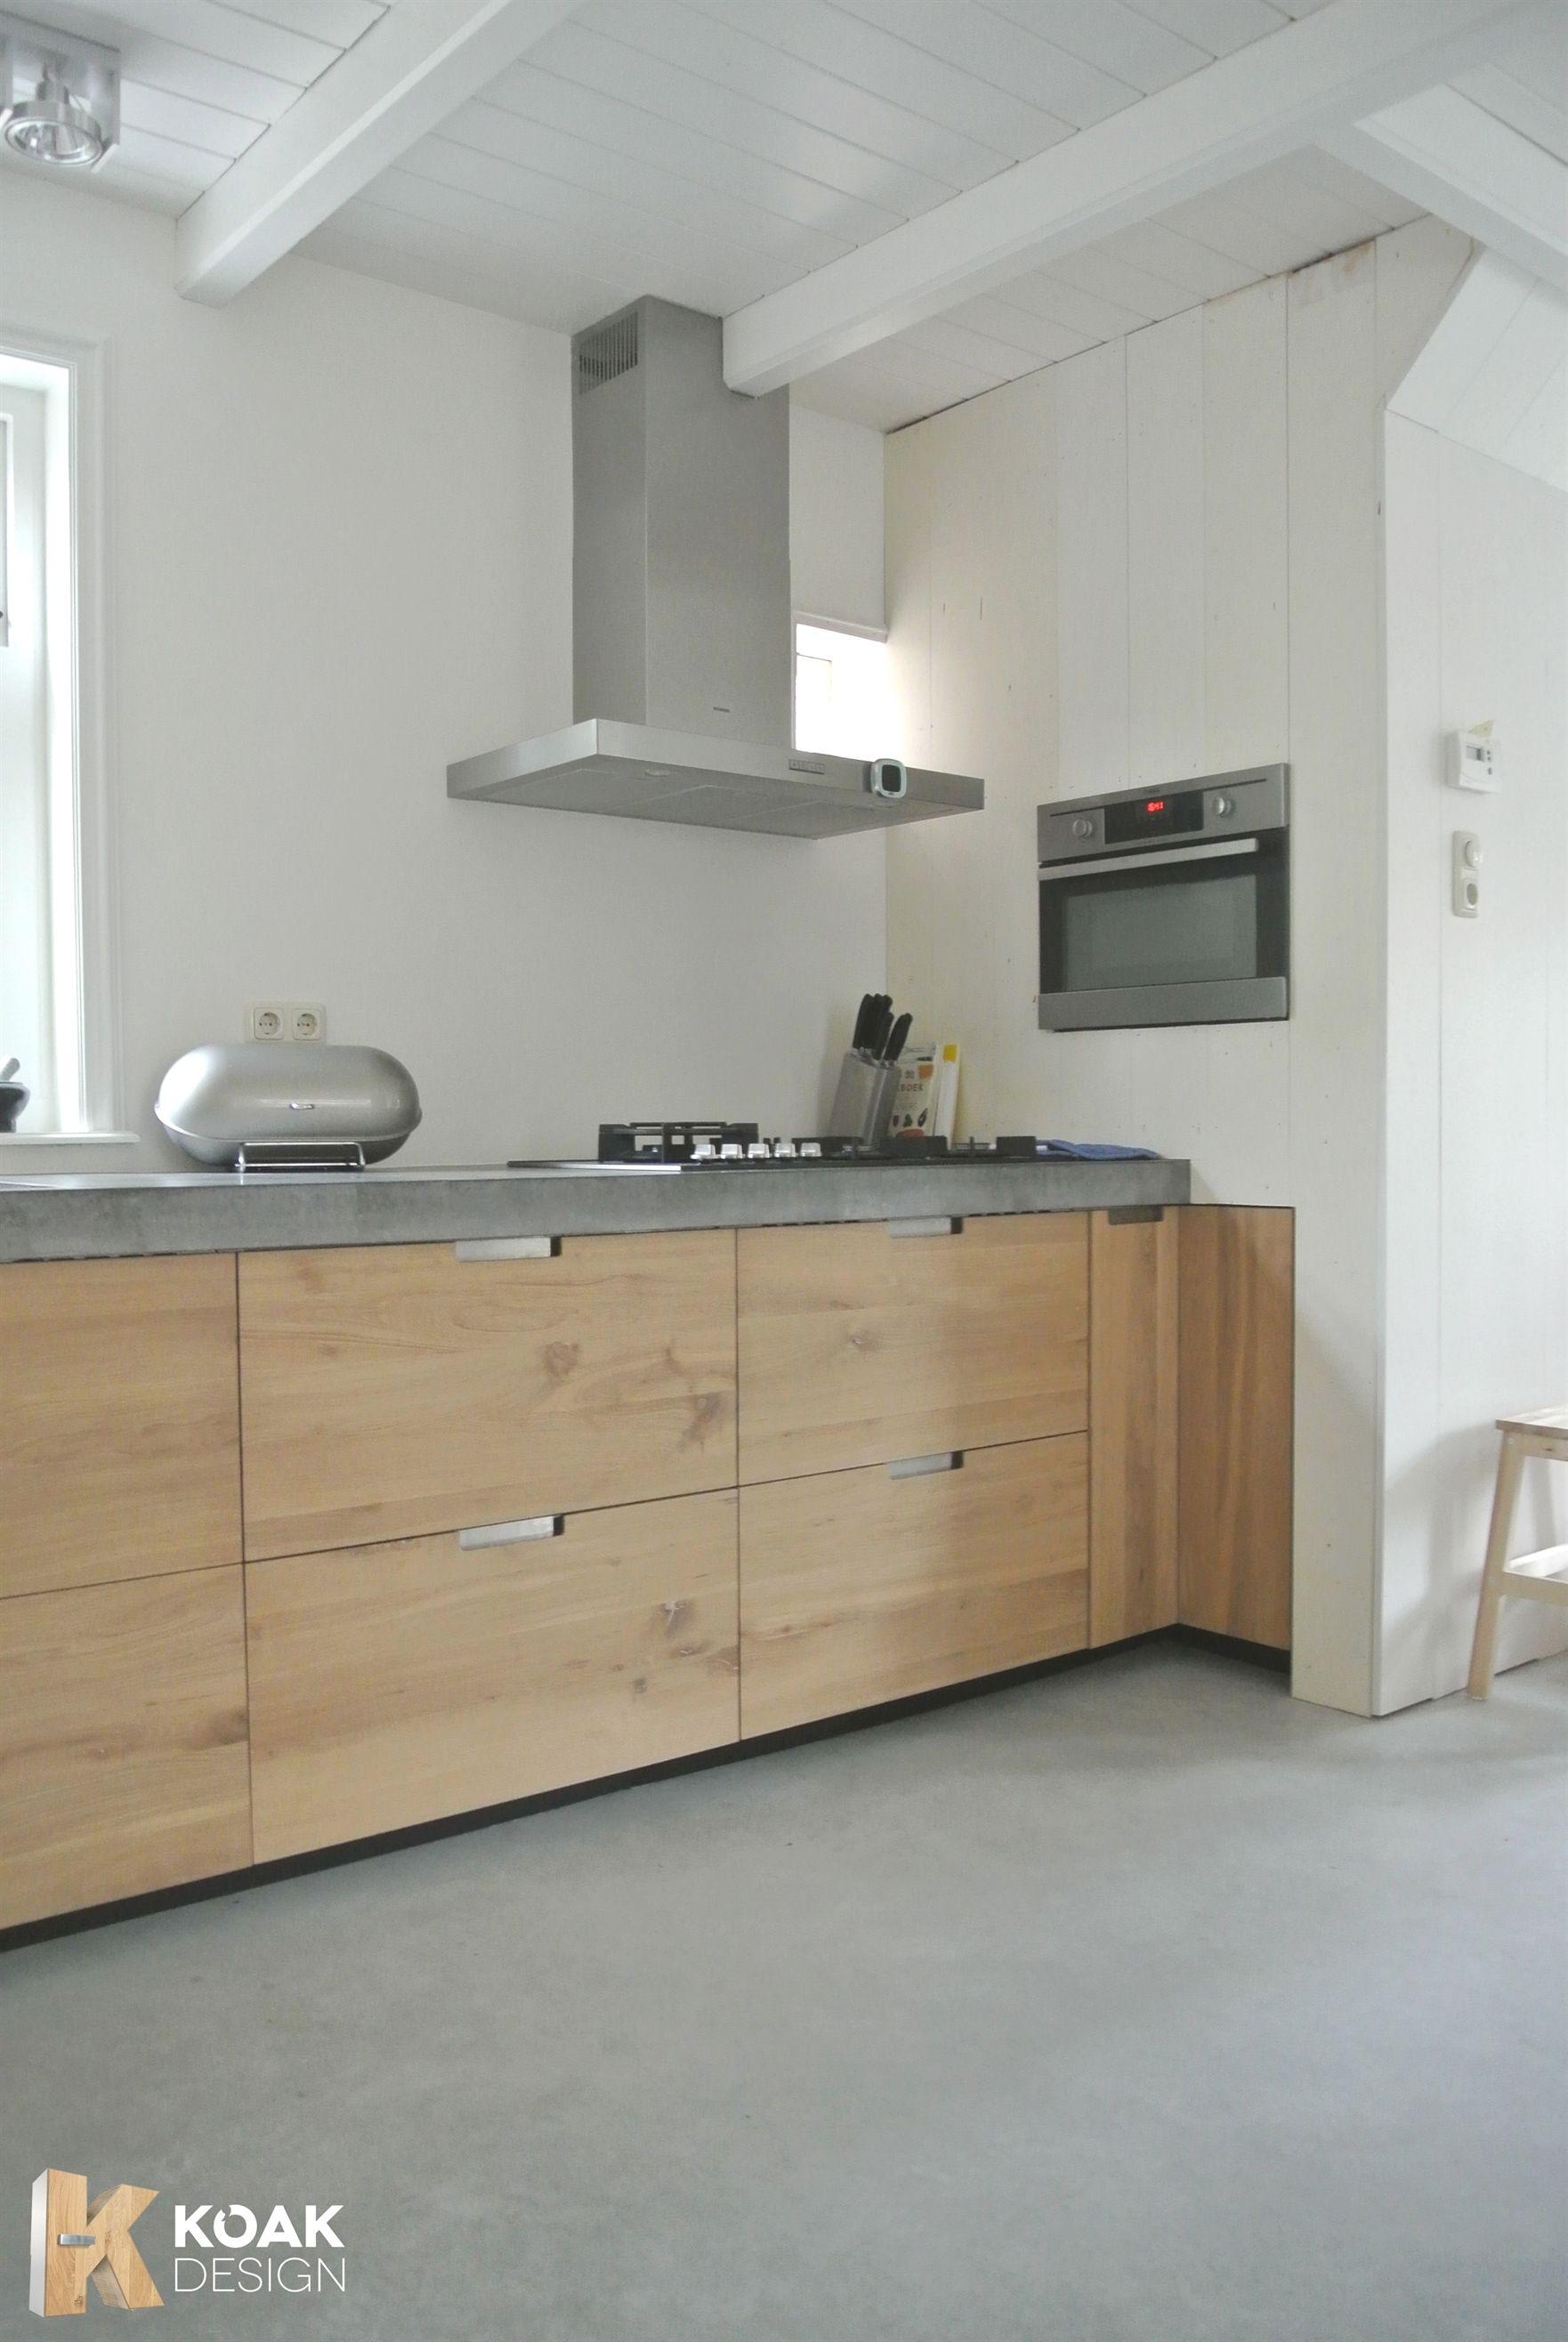 Ikea kitchen hack wooden doors for ikea kitchen